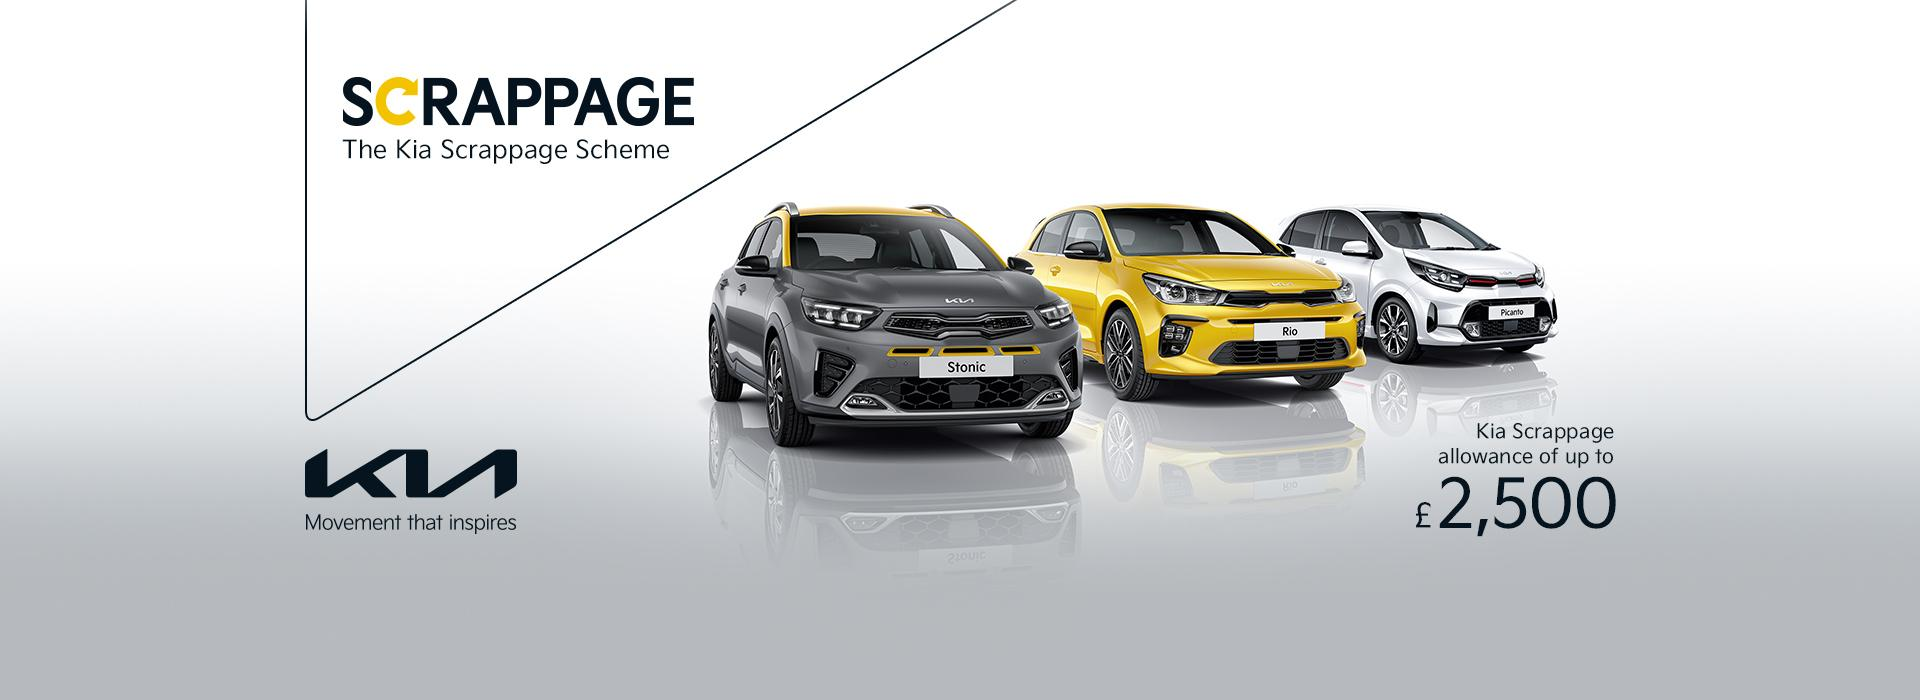 The Kia Scrappage Scheme at Drayton Motors